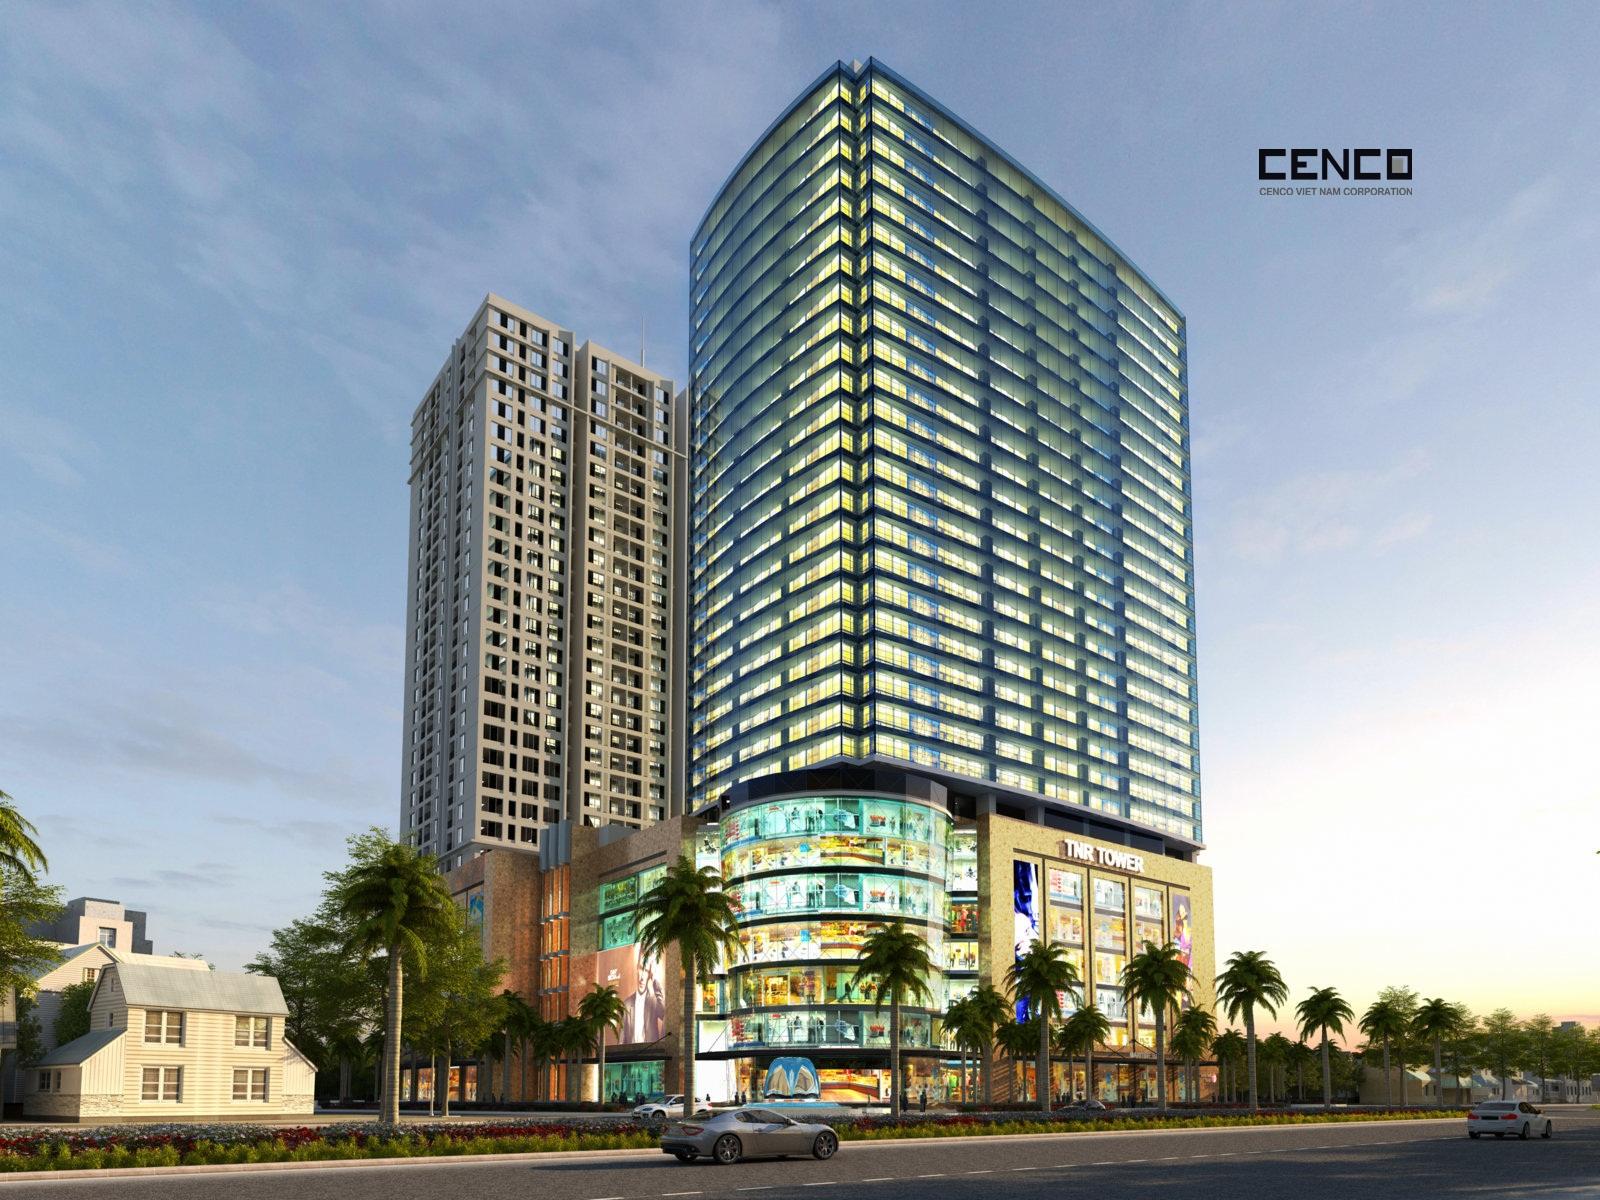 Cenco_tnr tower1